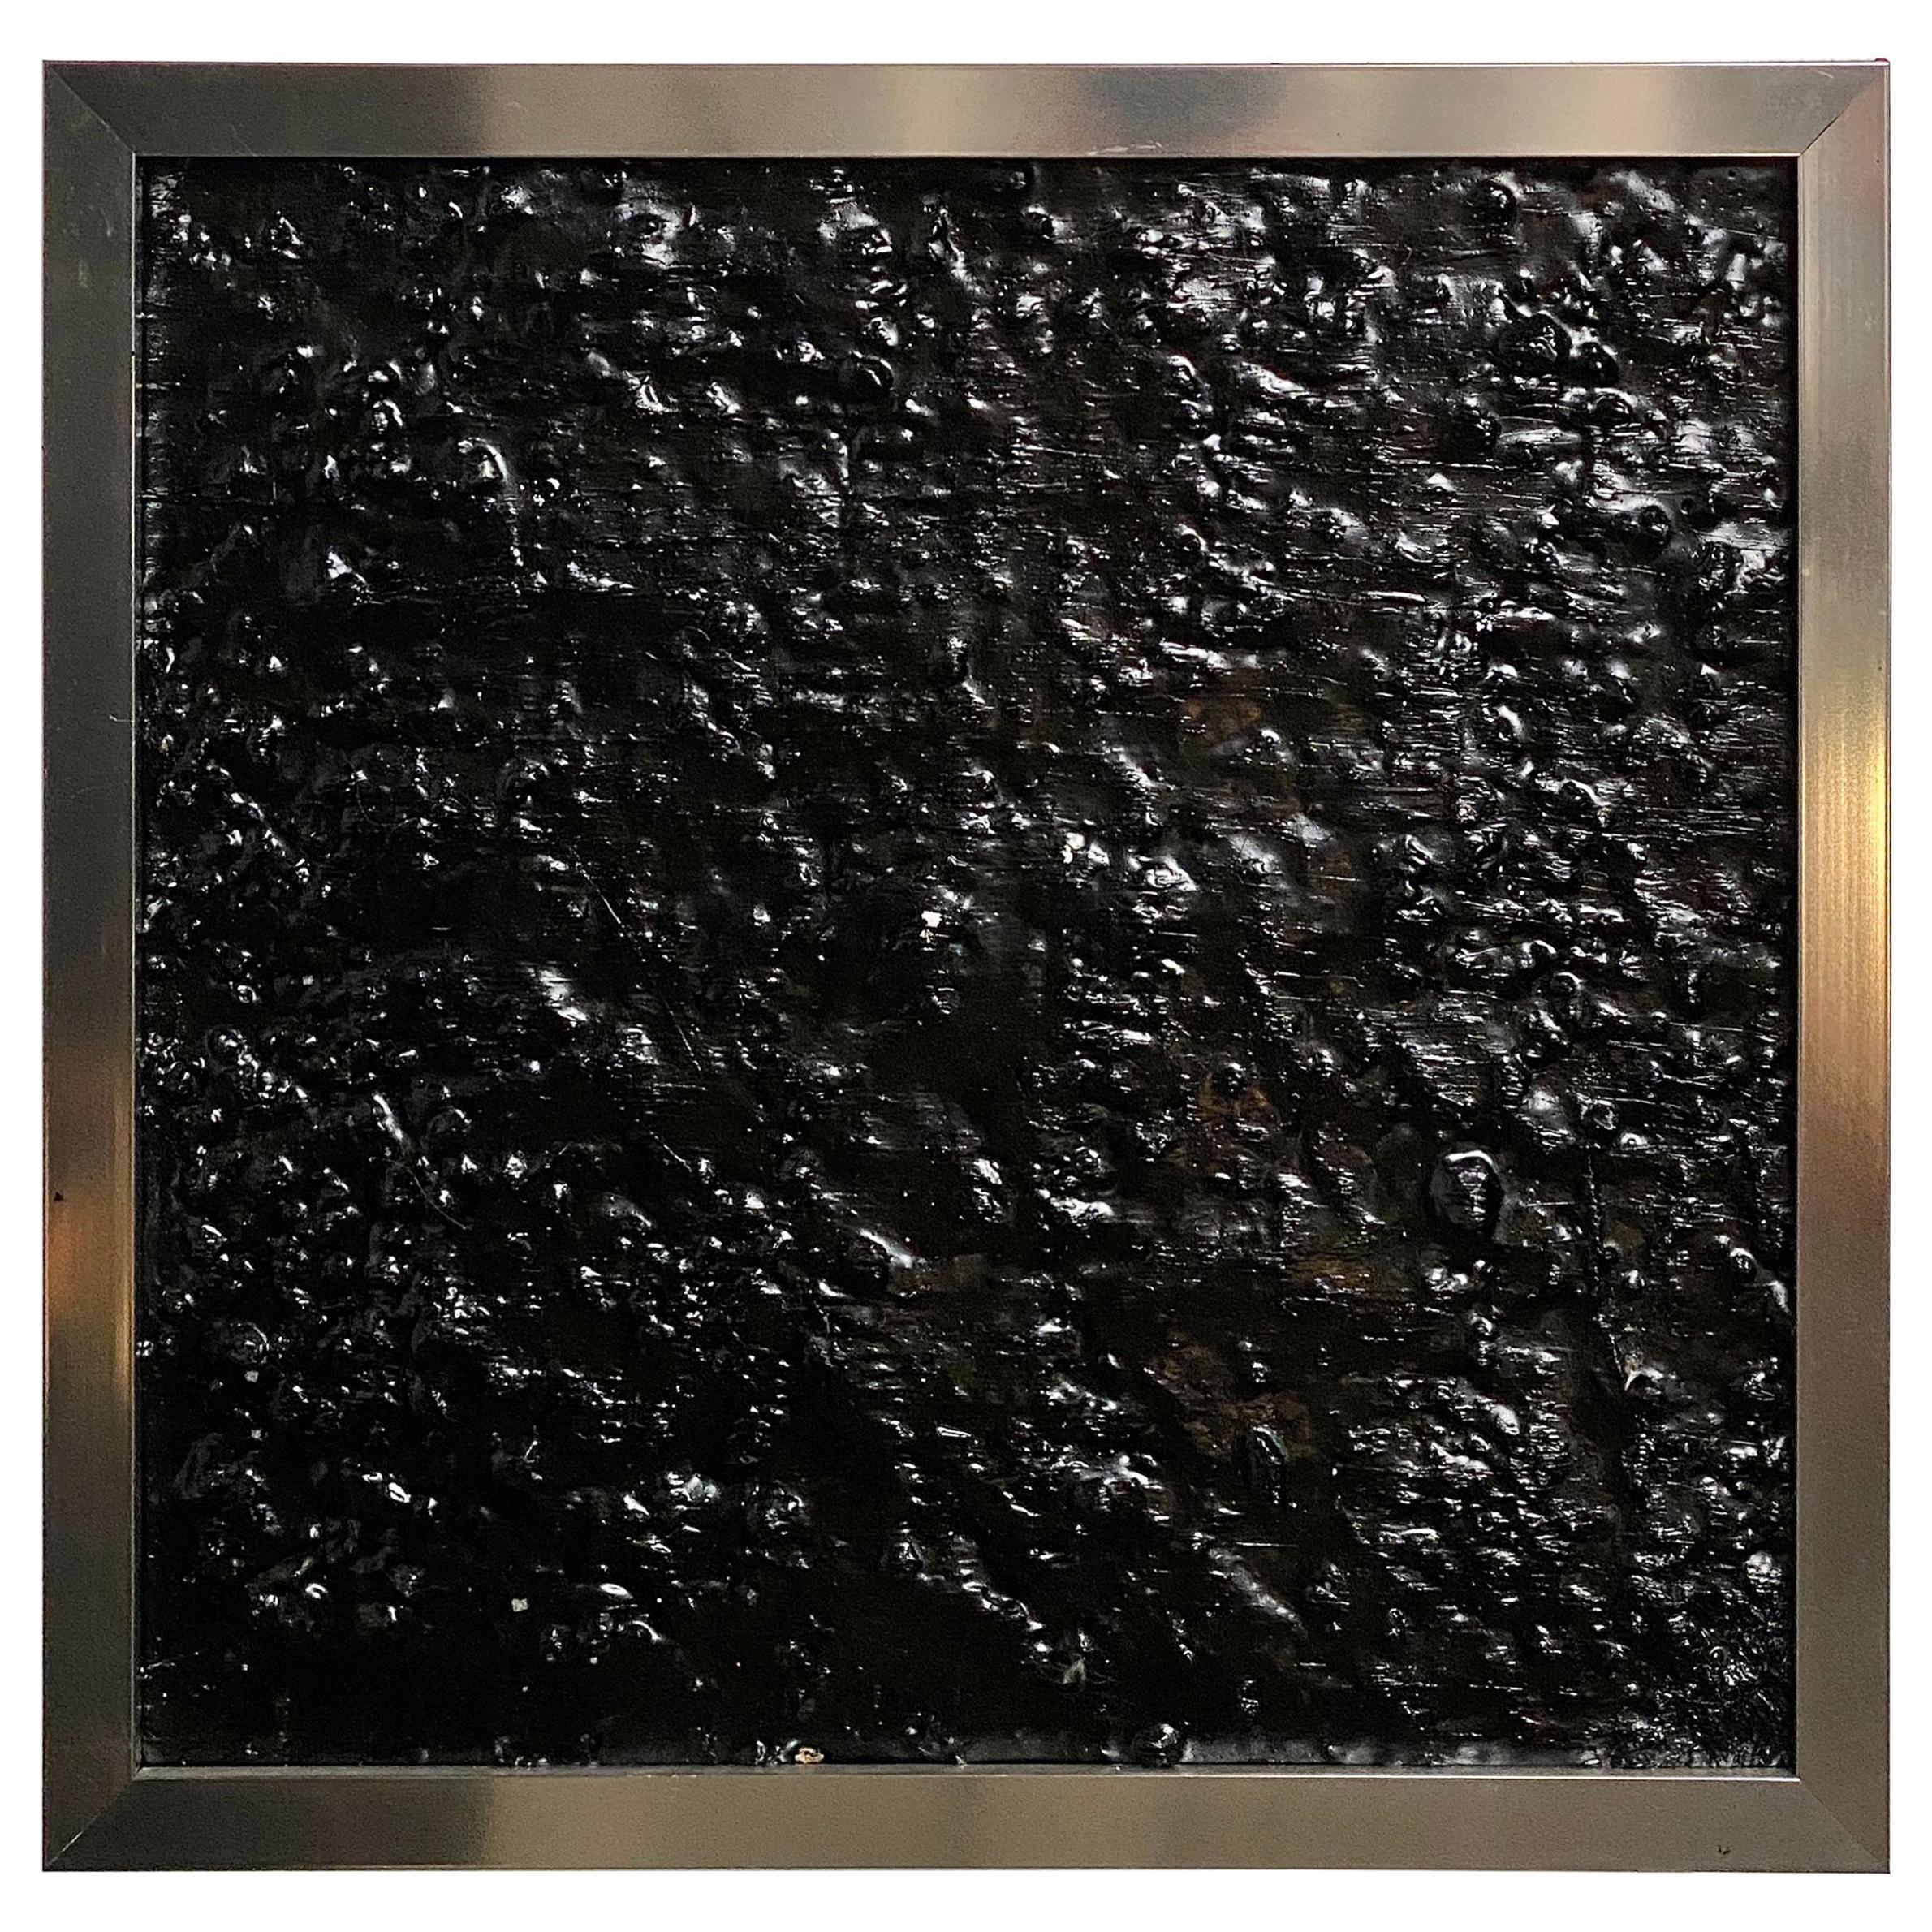 Black Tar Painting on Wood Framed in Metal, 21st Century by Mattia Biagi